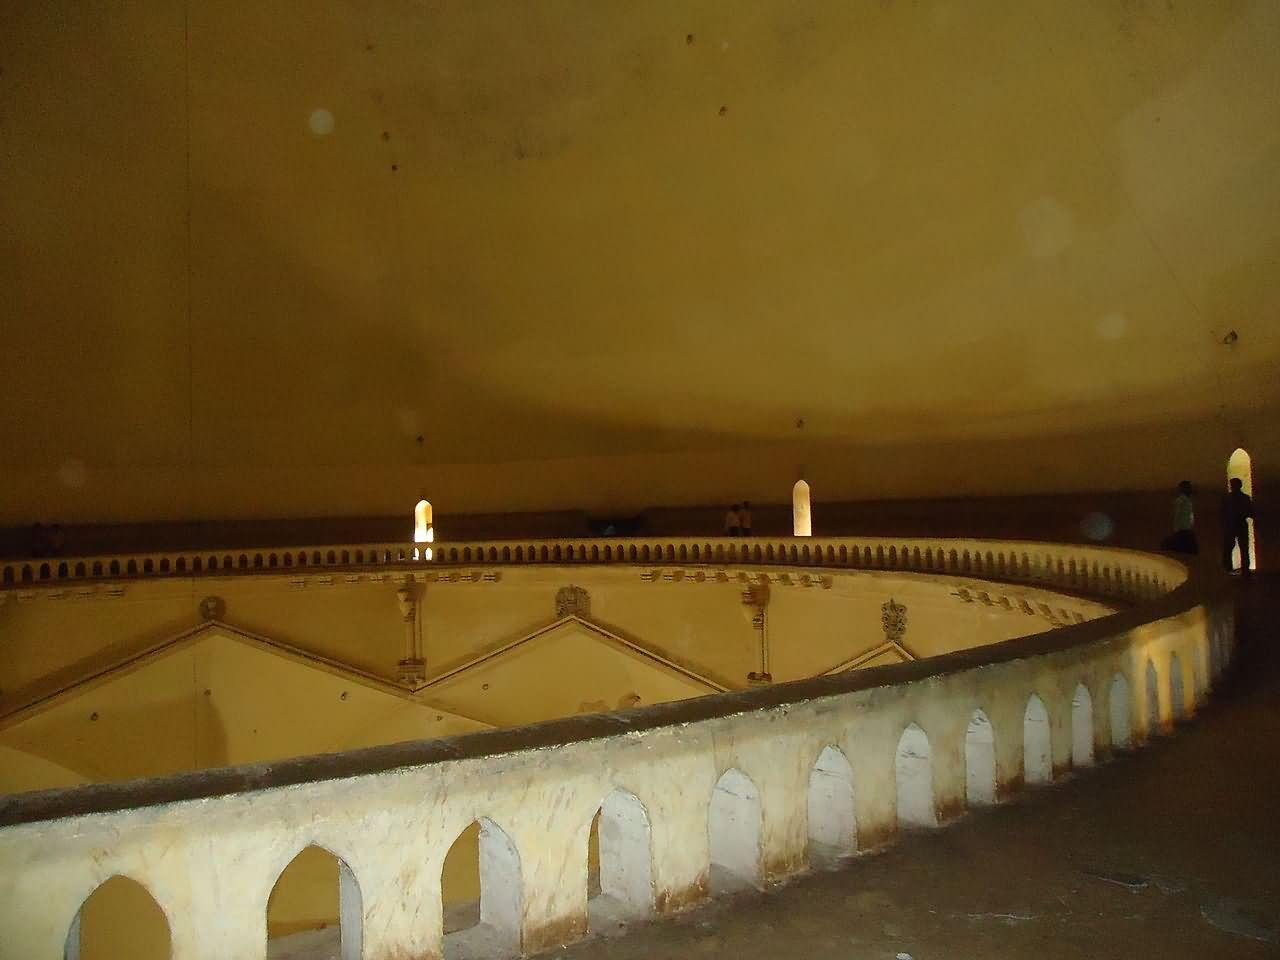 2045-a-view-of-whispering-gallery-gol-gumbaz-bijapur-karnataka-india